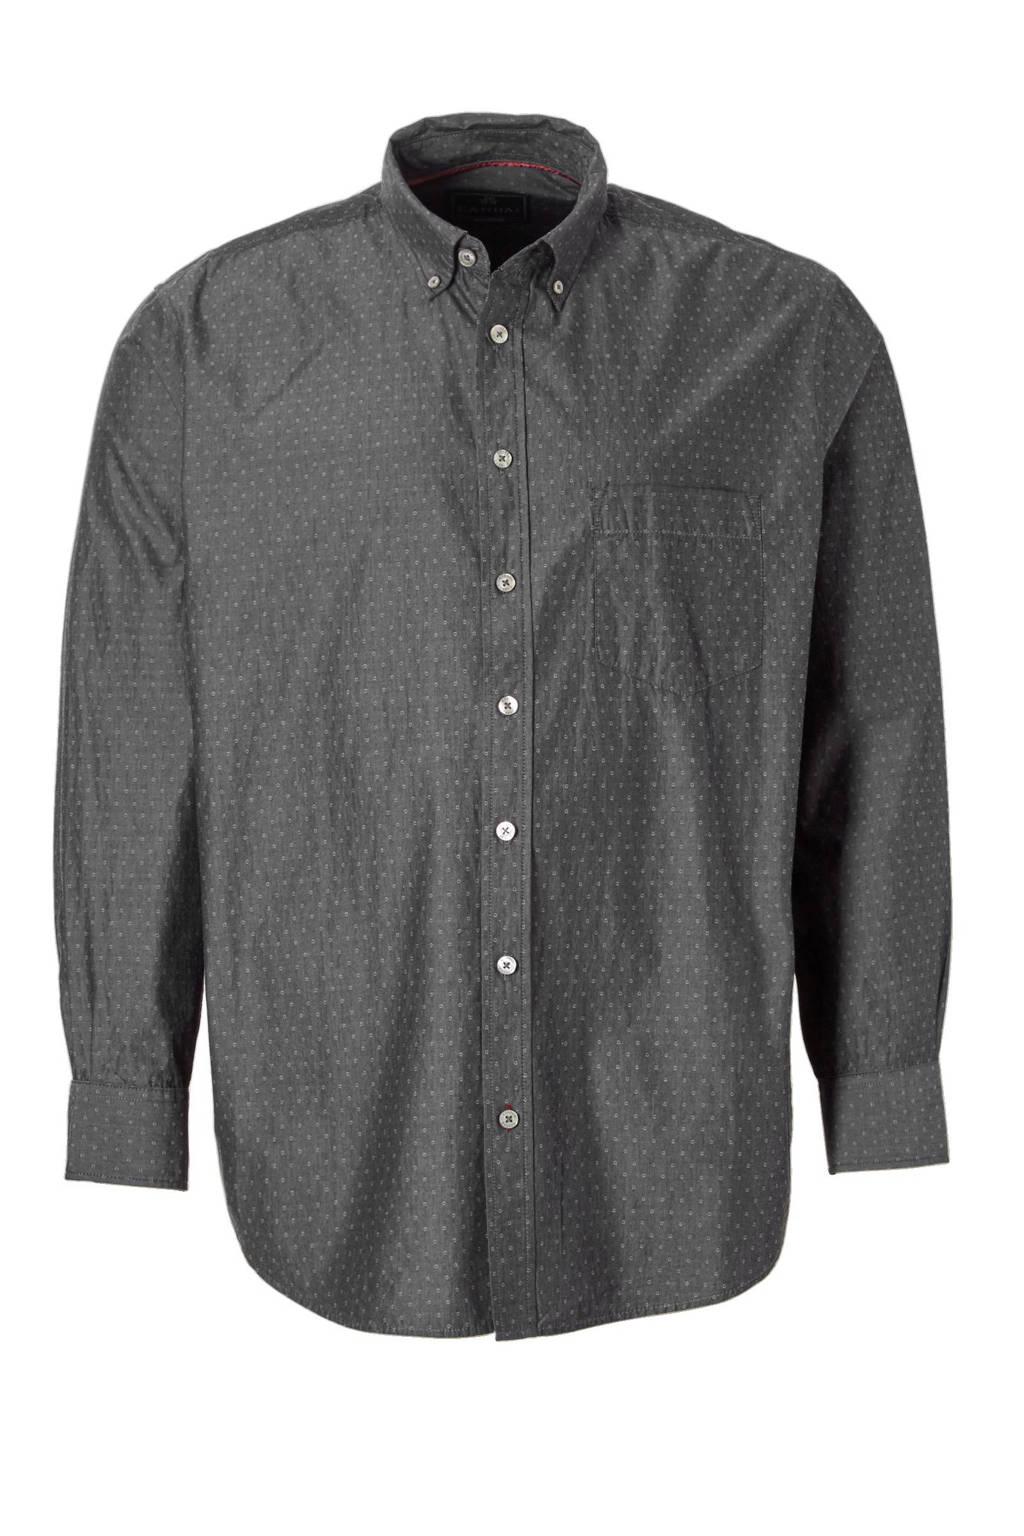 Grijs Overhemd Heren.C A Heren Xl Regular Fit Overhemd Wehkamp